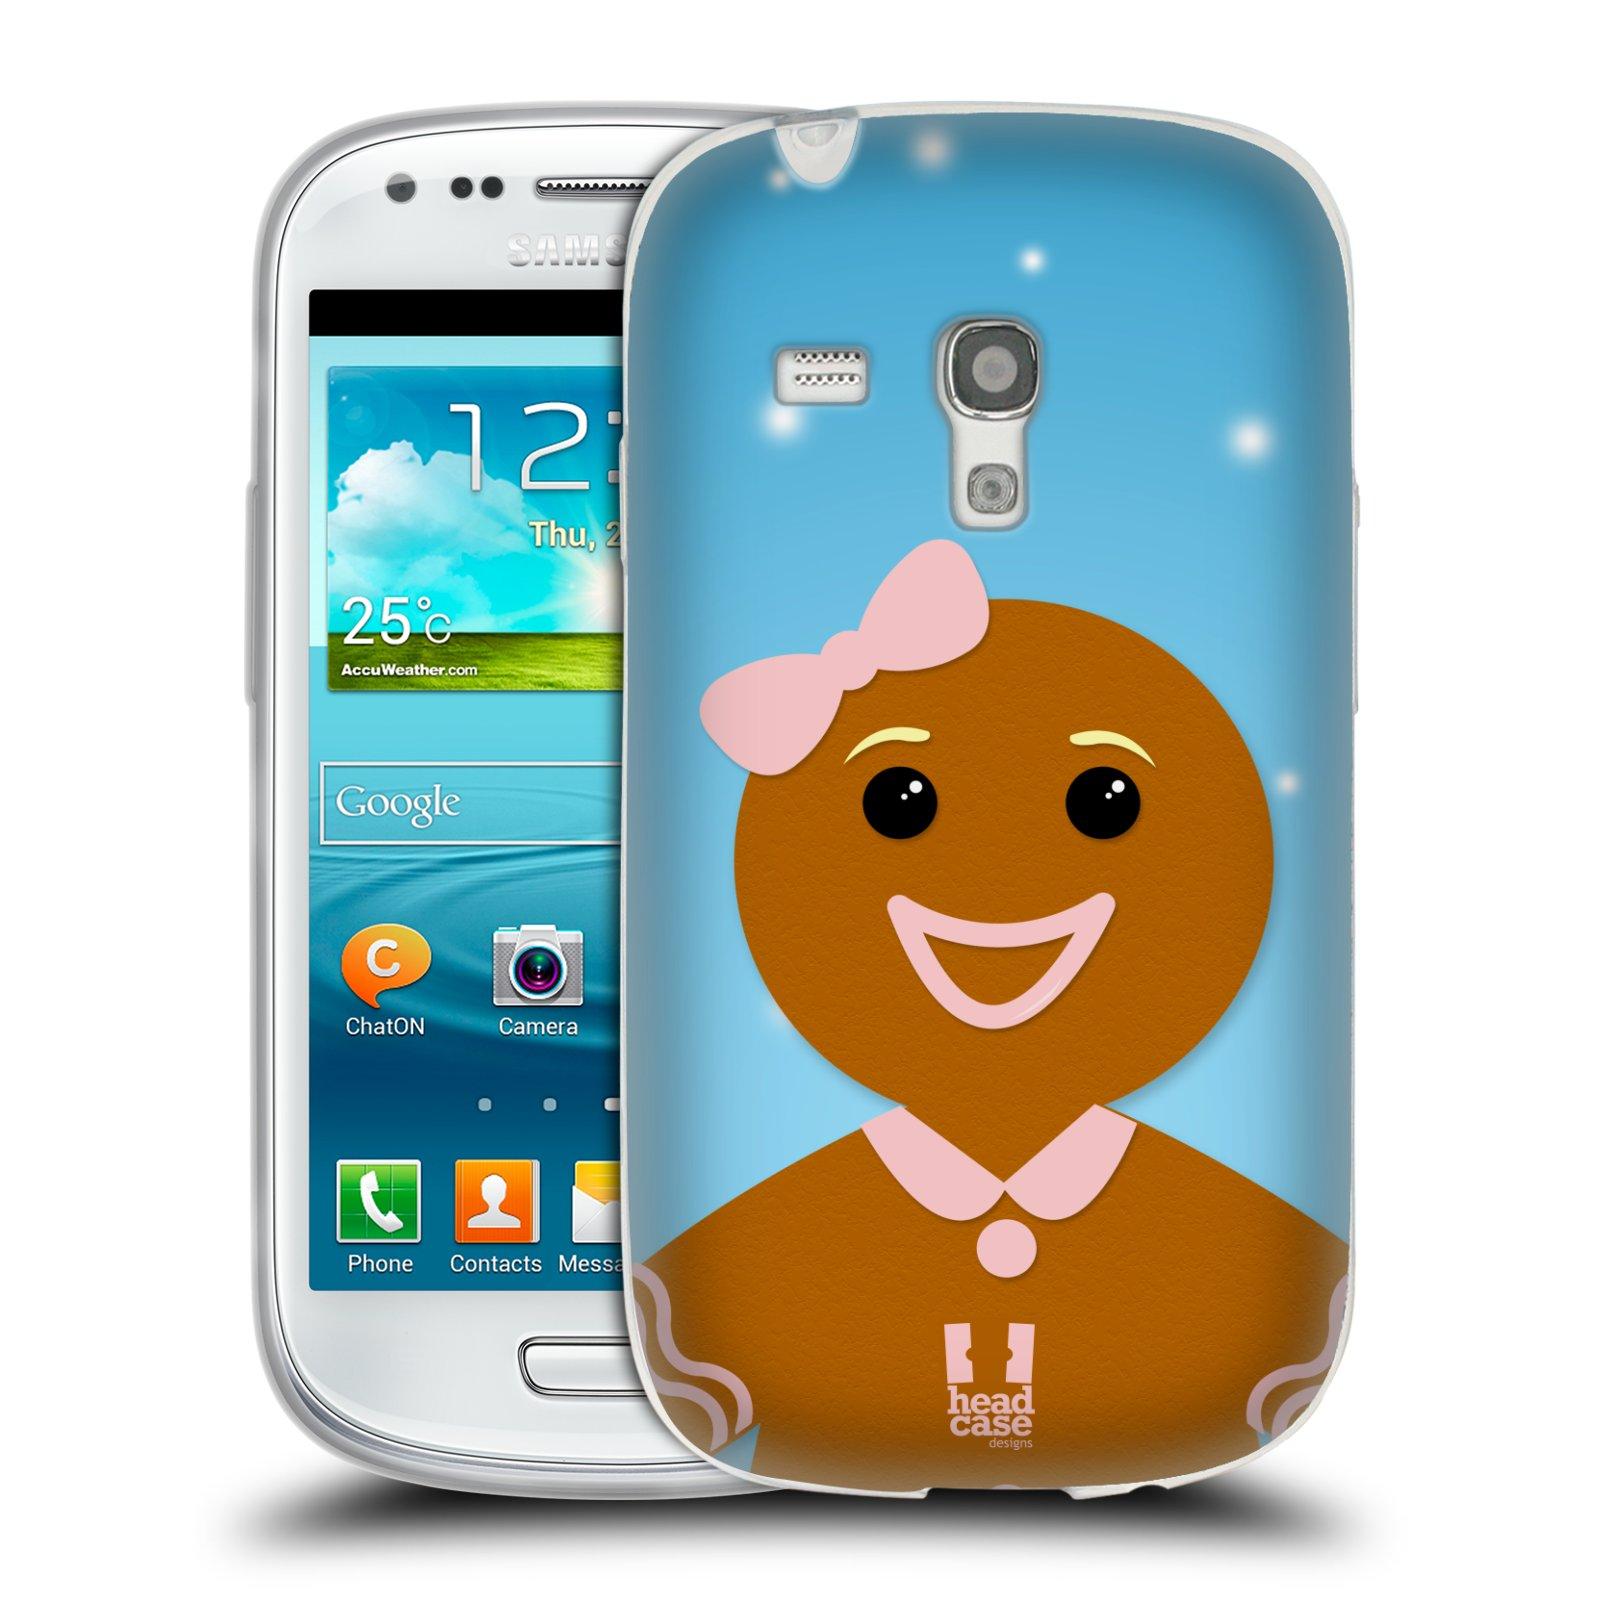 Silikonové pouzdro na mobil Samsung Galaxy S III Mini HEAD CASE VÁNOCE PERNÍČEK (Silikonový kryt či obal na mobilní telefon Samsung Galaxy S III Mini GT-i8190)